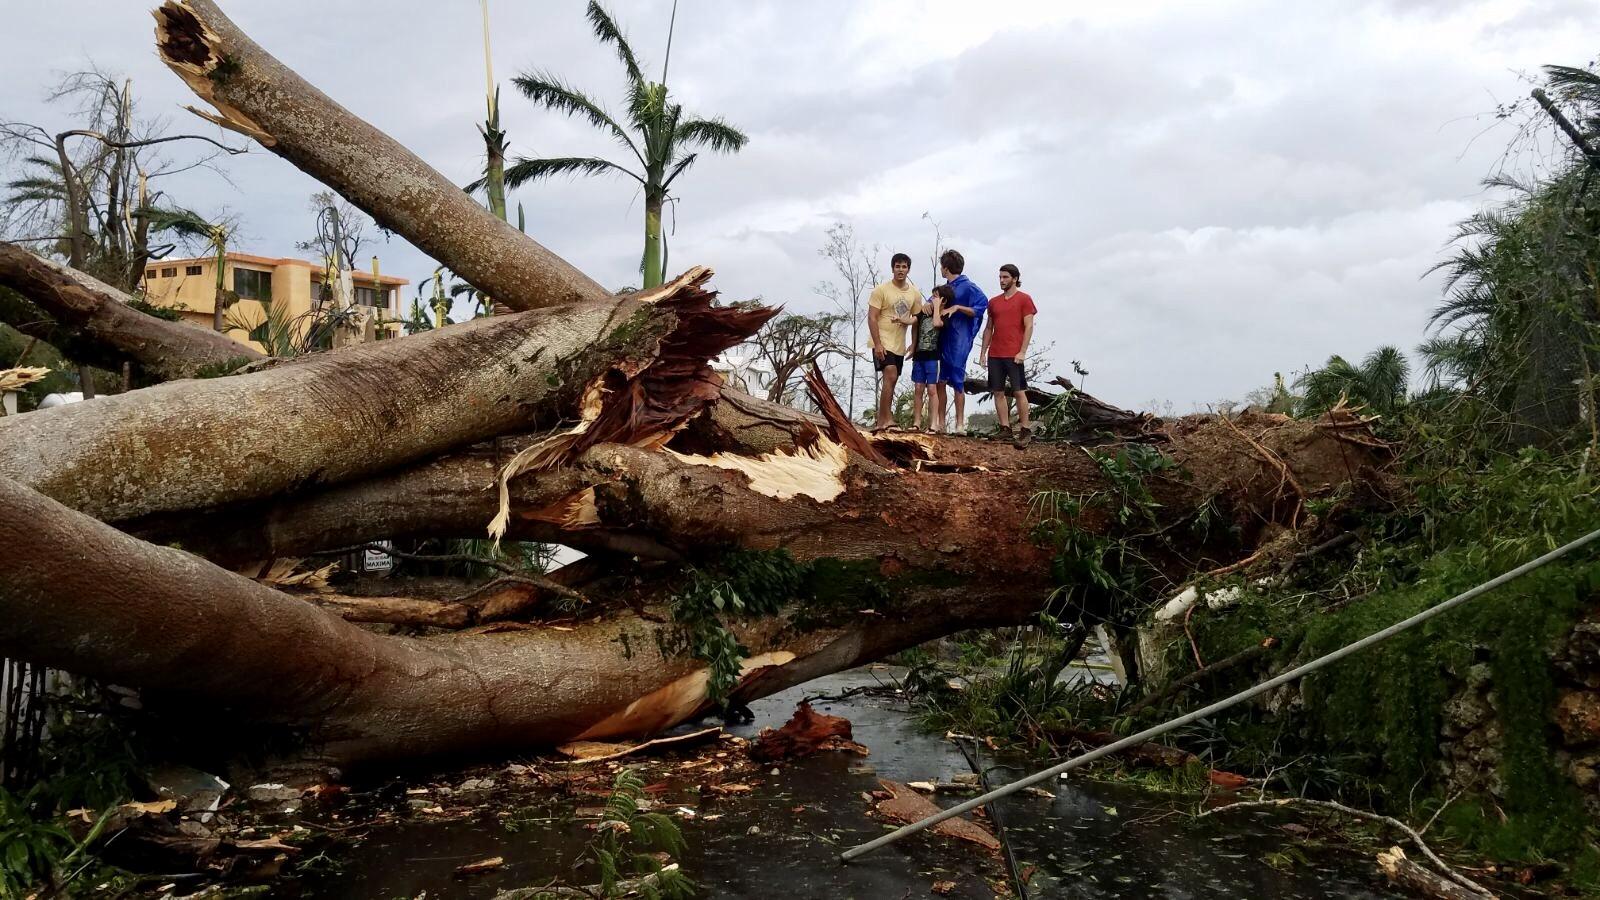 Puerto Ricans Face Devastated Landscape After Hurricane